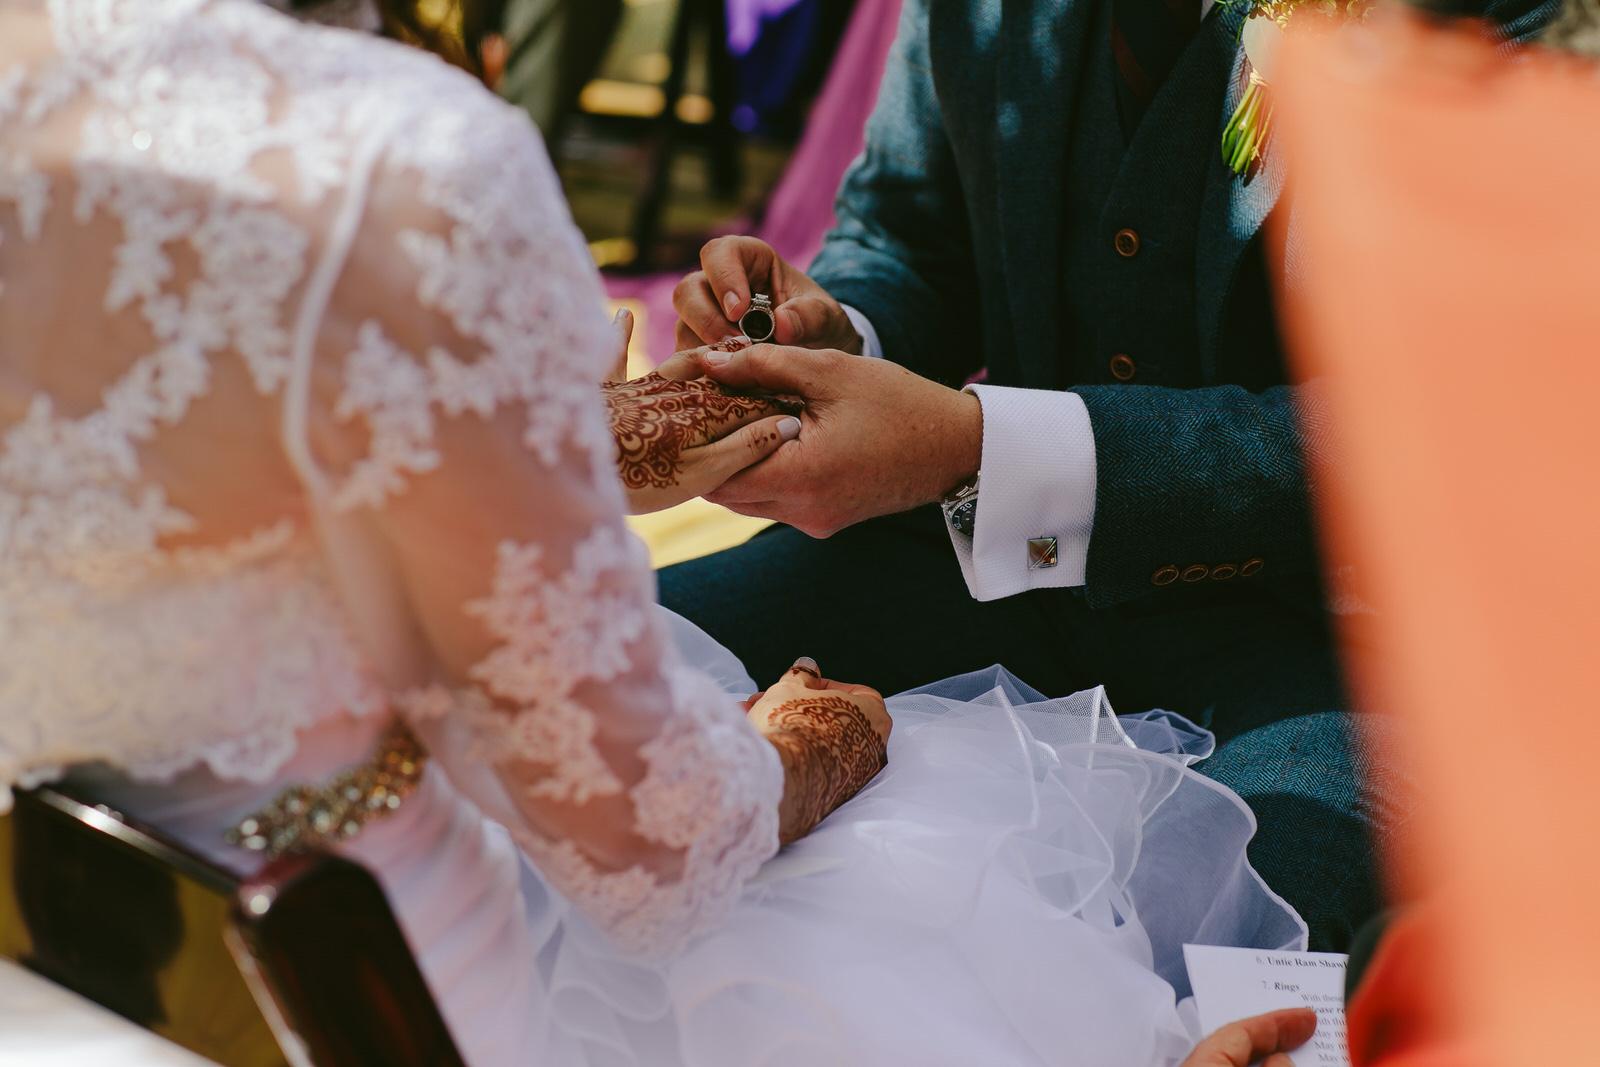 kashi-ashram-wedding-ceremony-sebastian-florida-tiny-house-photo-67.jpg